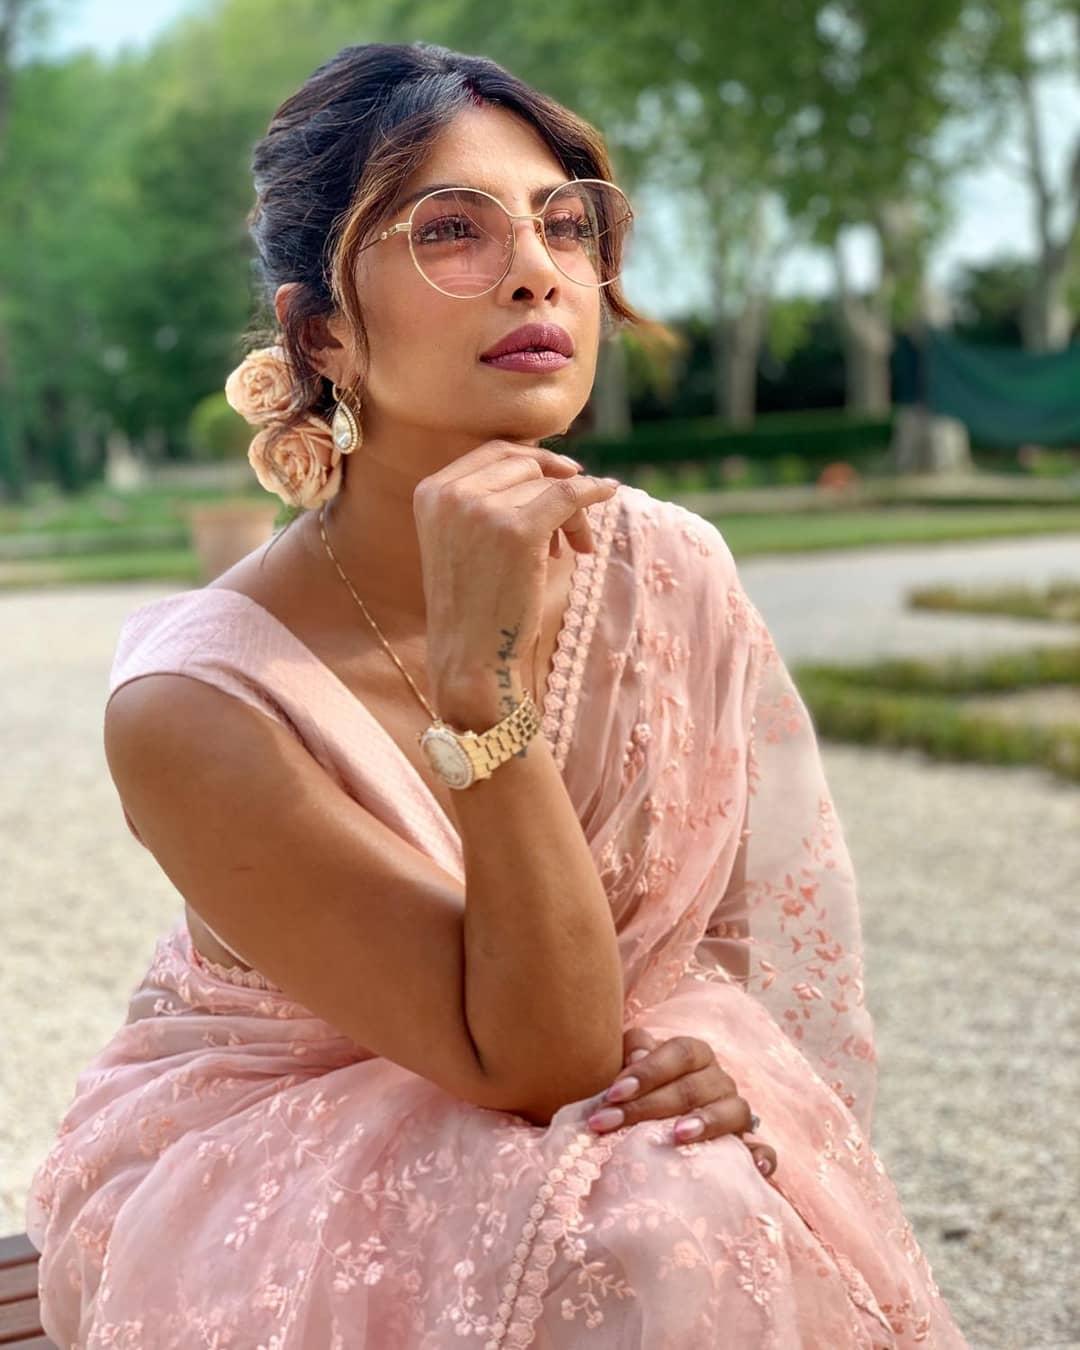 Bollywood Tadka, प्रियंका चोपड़ा इमेज, प्रियंका चोपड़ा फोटो, प्रियंका चोपड़ा पिक्चर